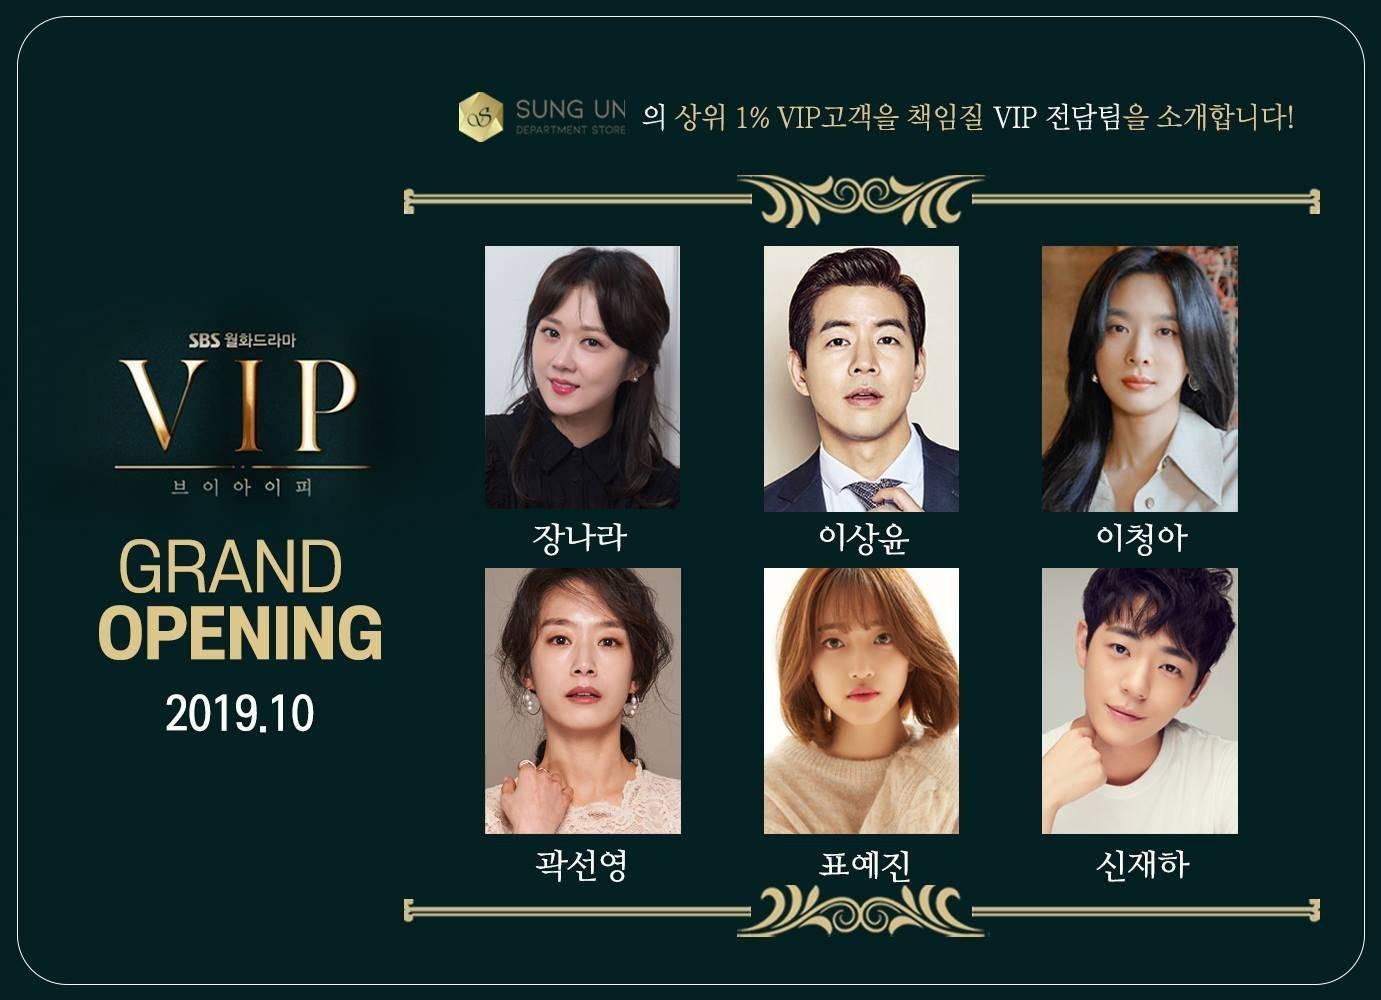 Vip Korean Drama 2019 Vip At Hancinema The Korean